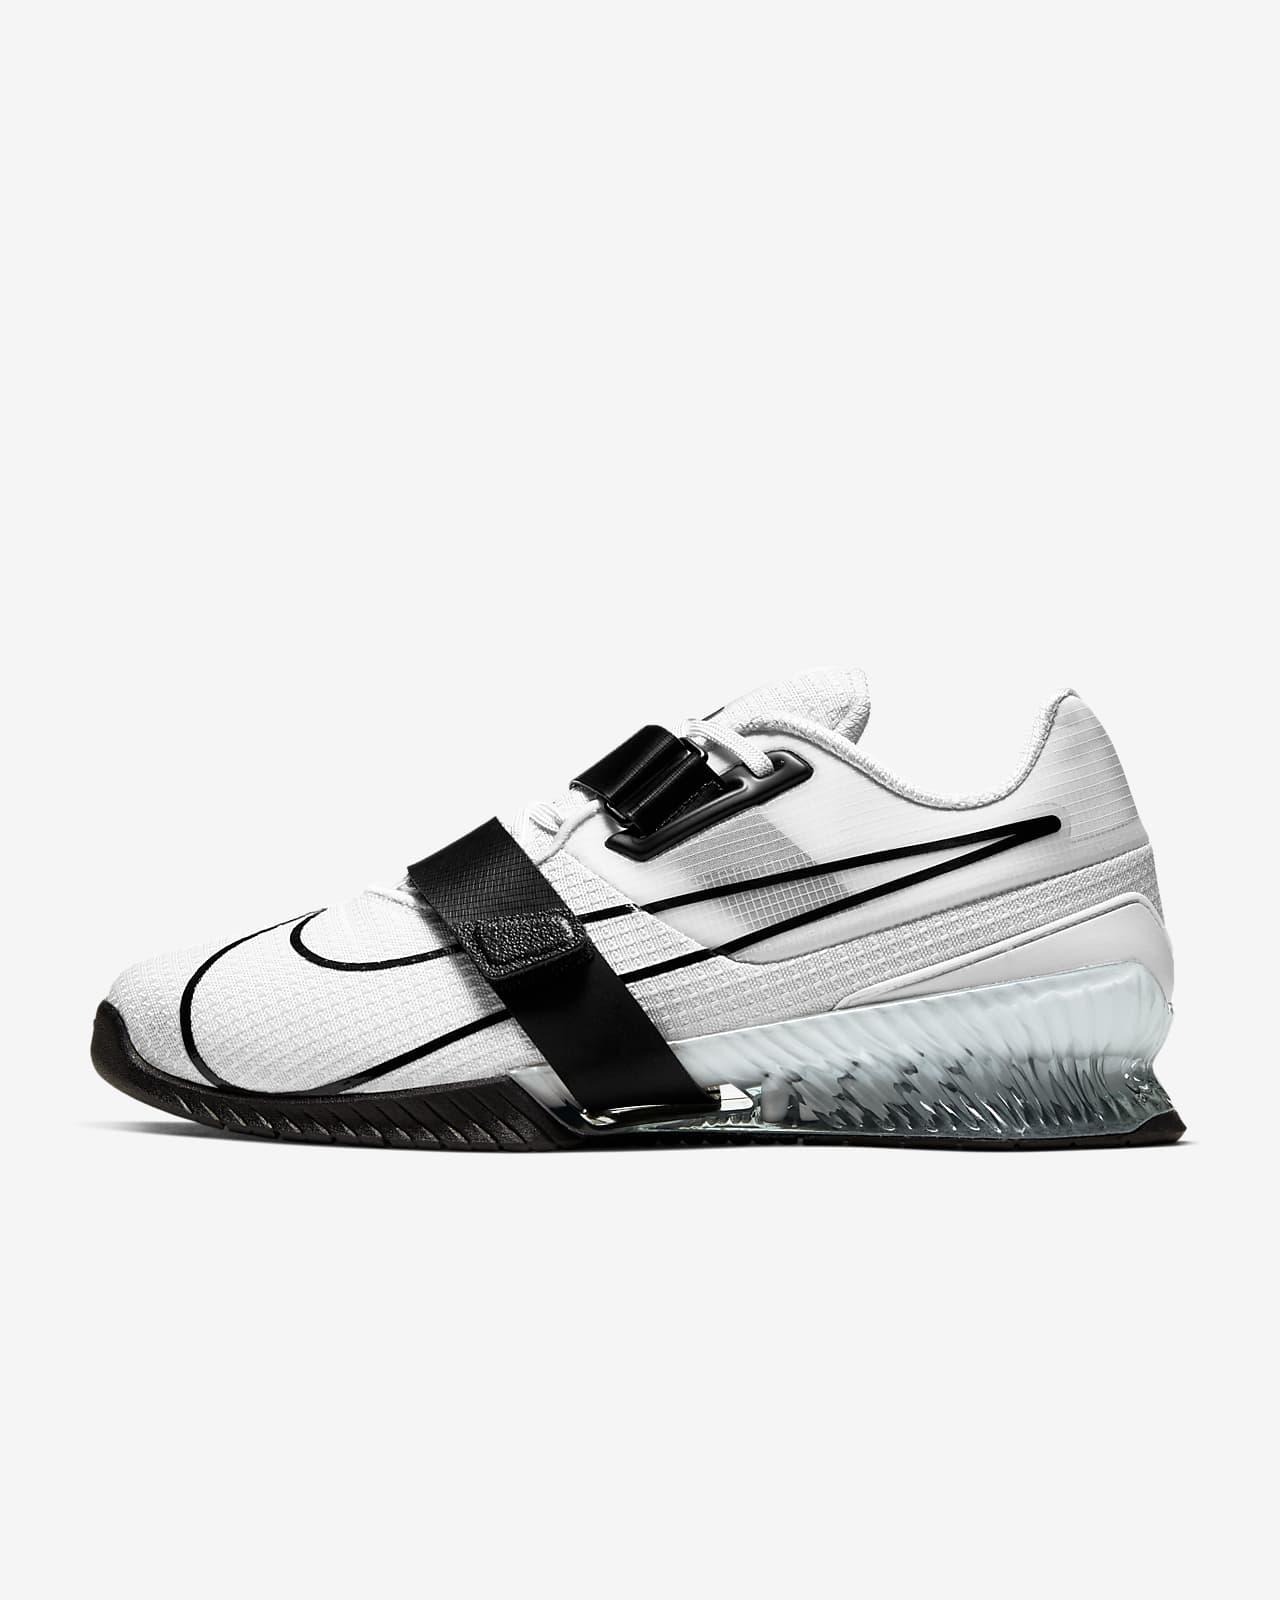 Nike Romaleos 4 Training Shoe. Nike LU